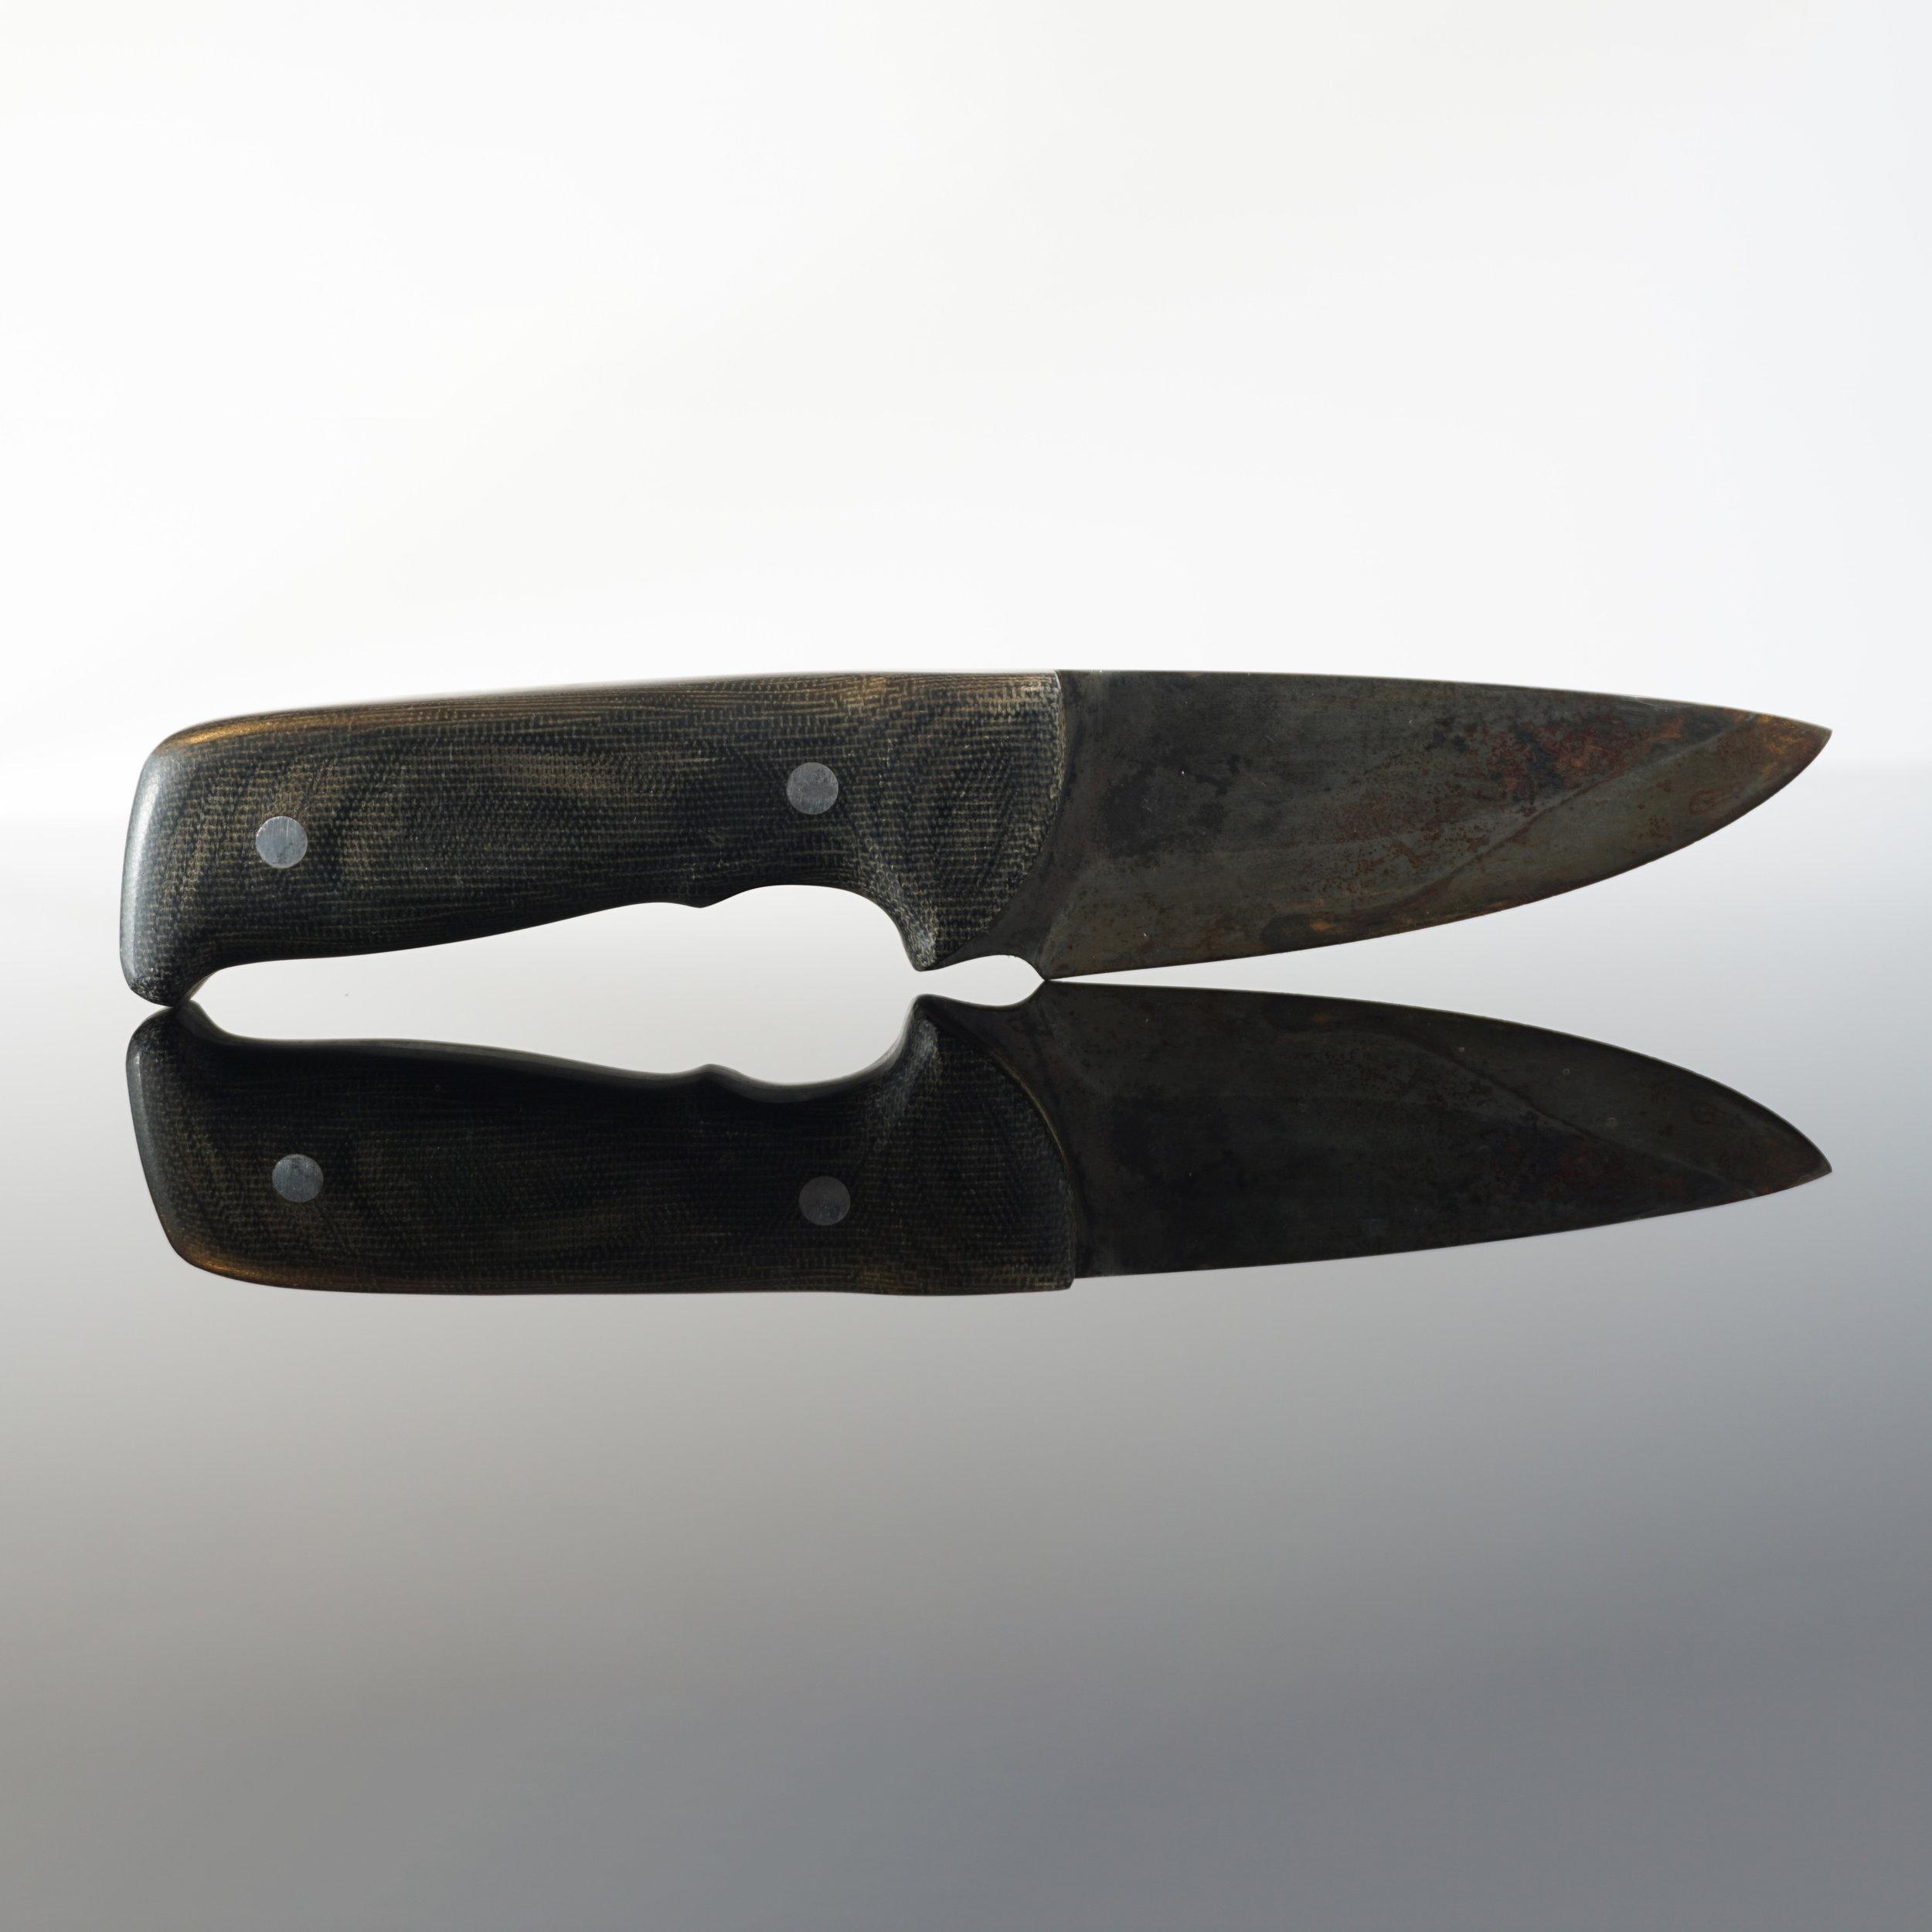 squared knife.jpg